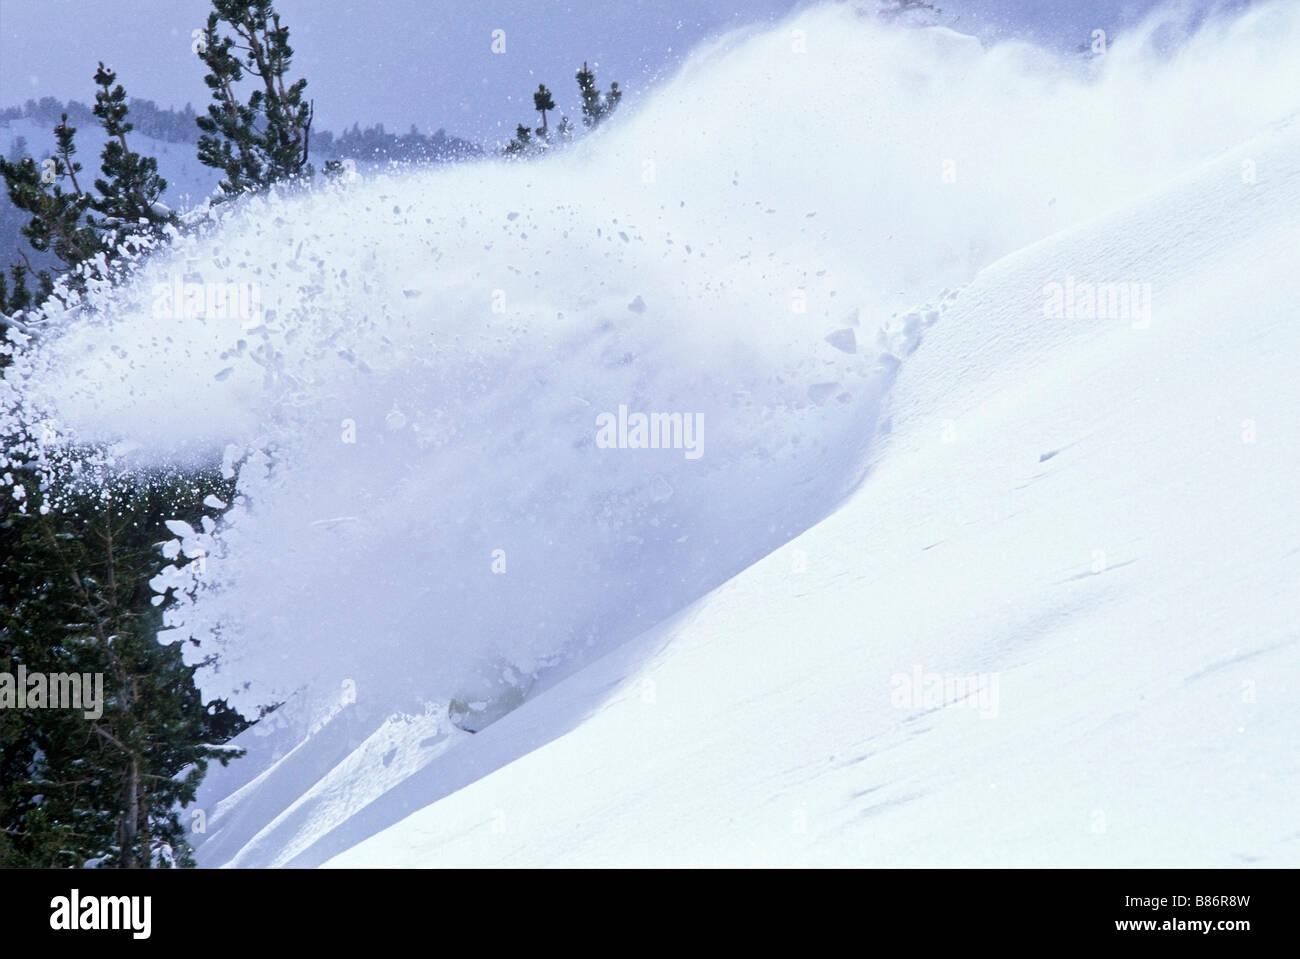 Snowboarder in powder, Mt. Rose, Nevada, USA Stock Photo